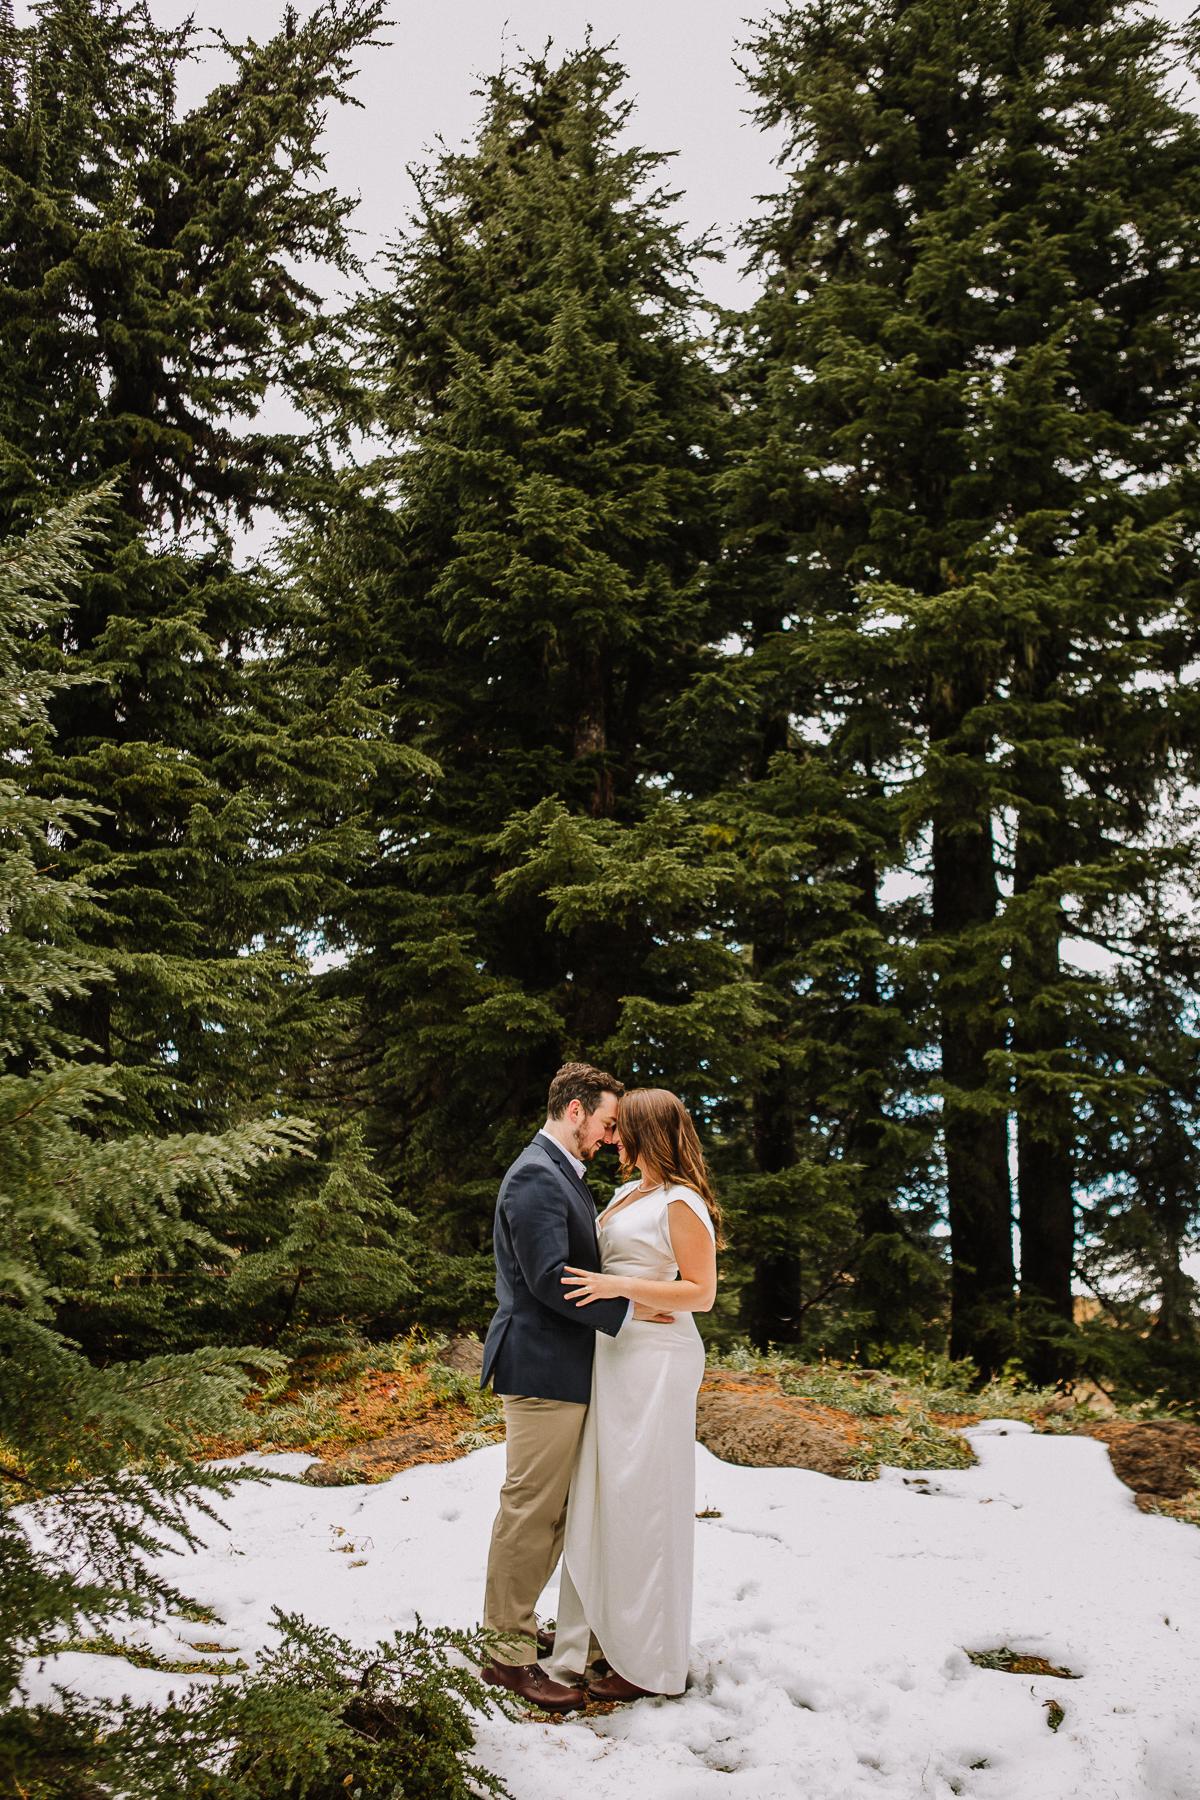 Crista + Jack Engagement-12.jpg